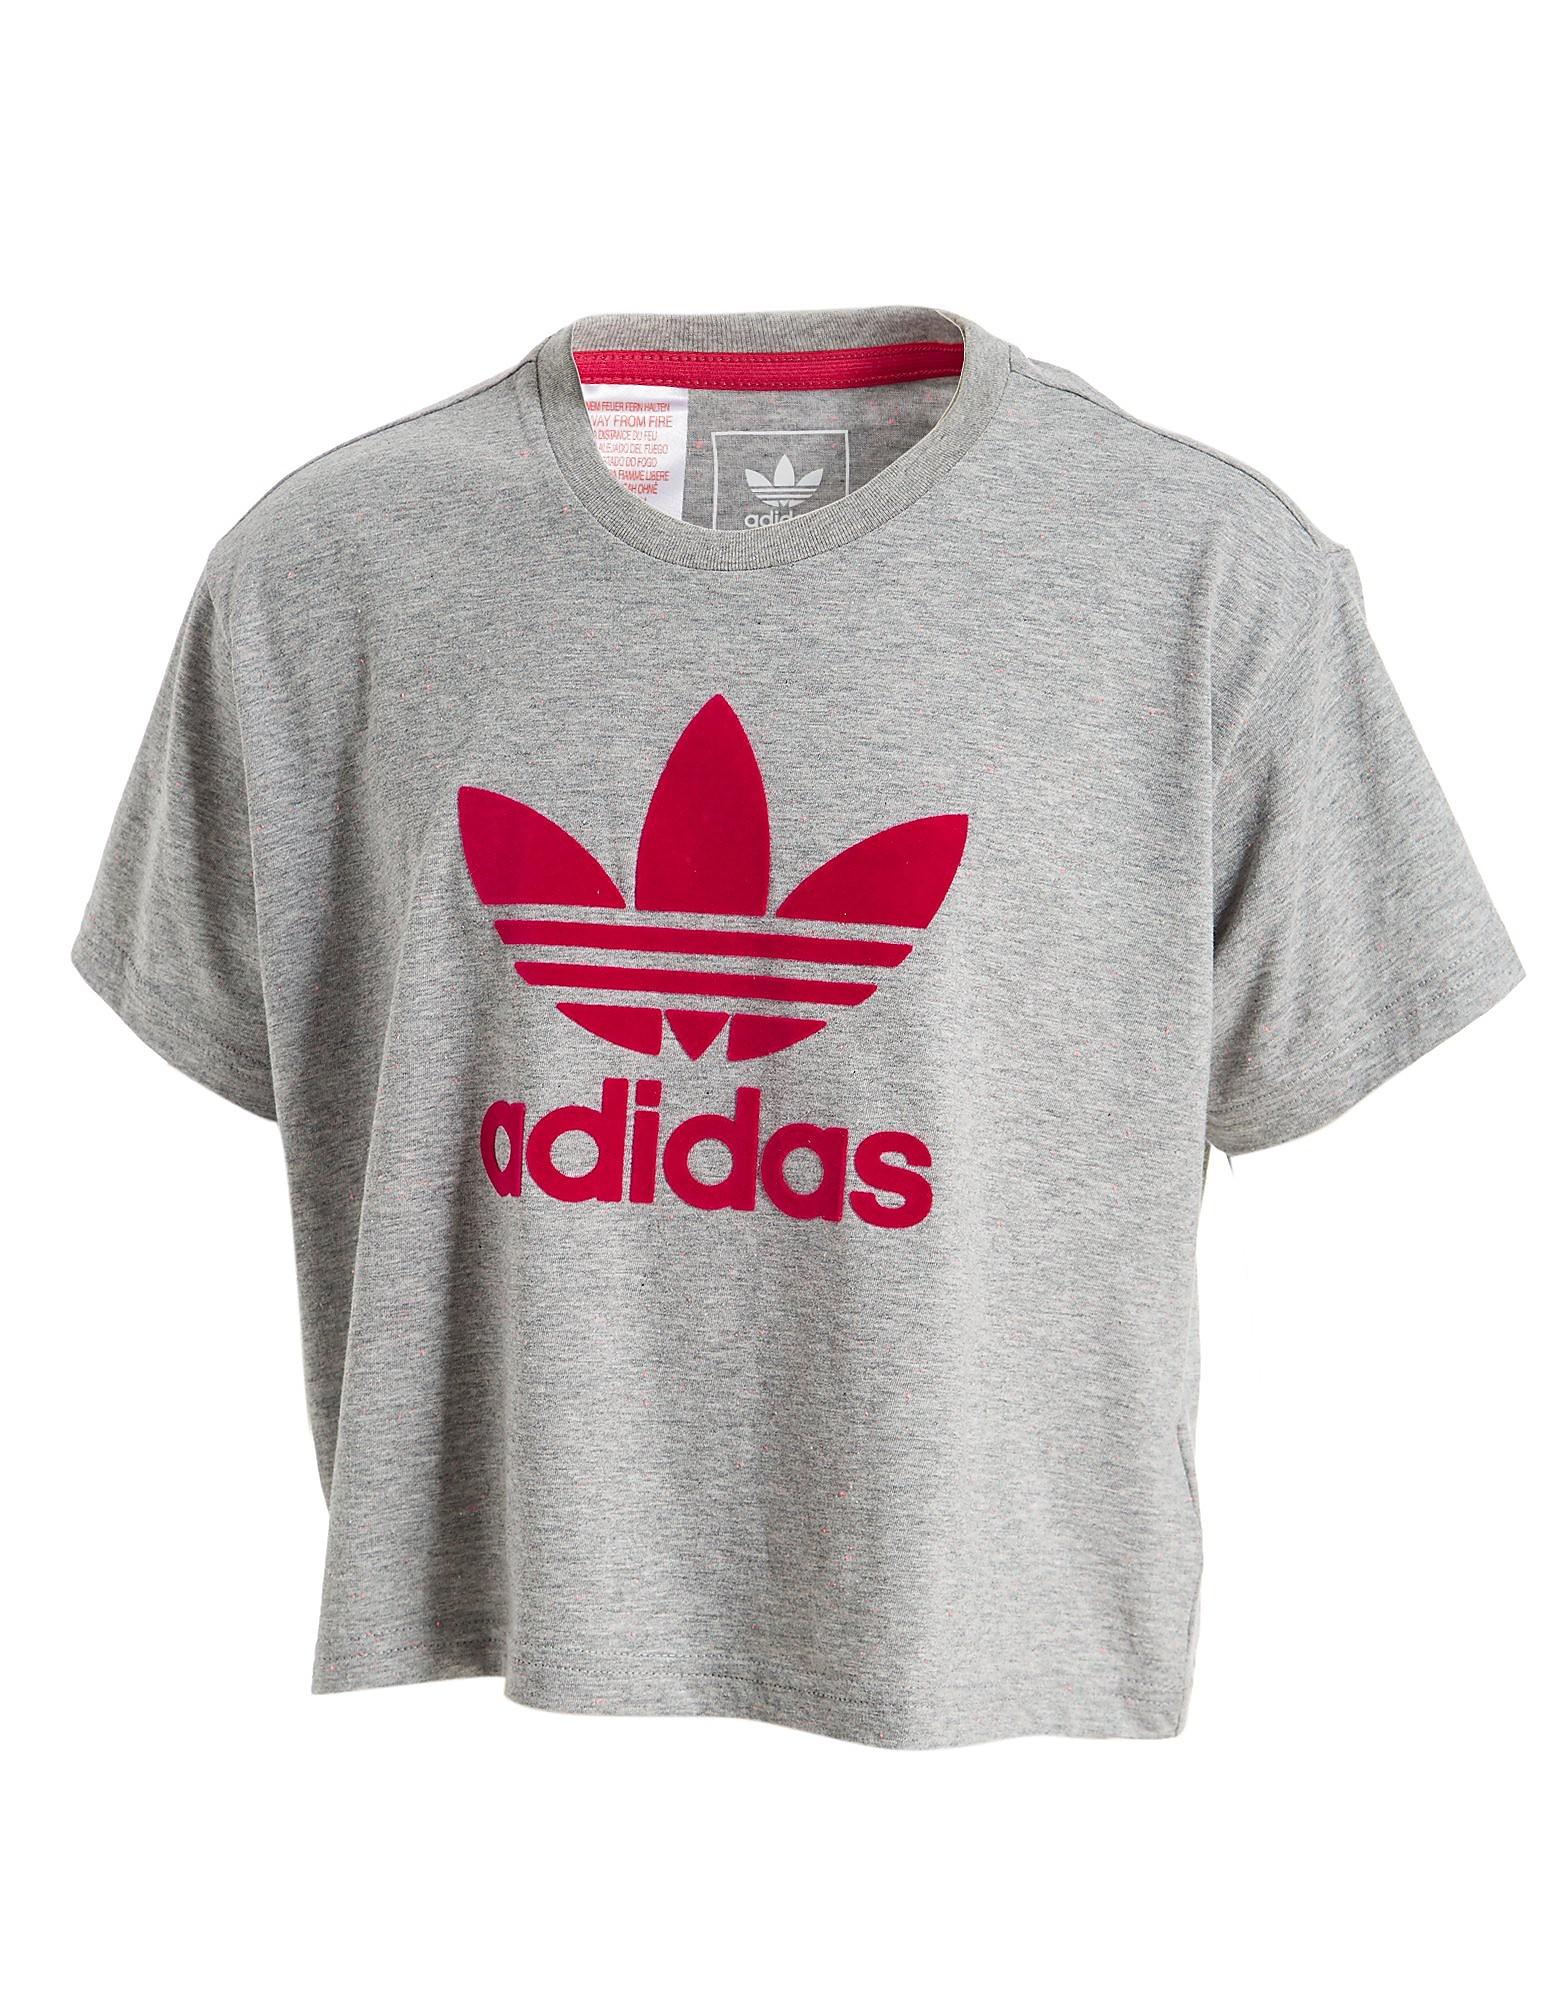 adidas Originals Girls' Crop T-Shirt Junior